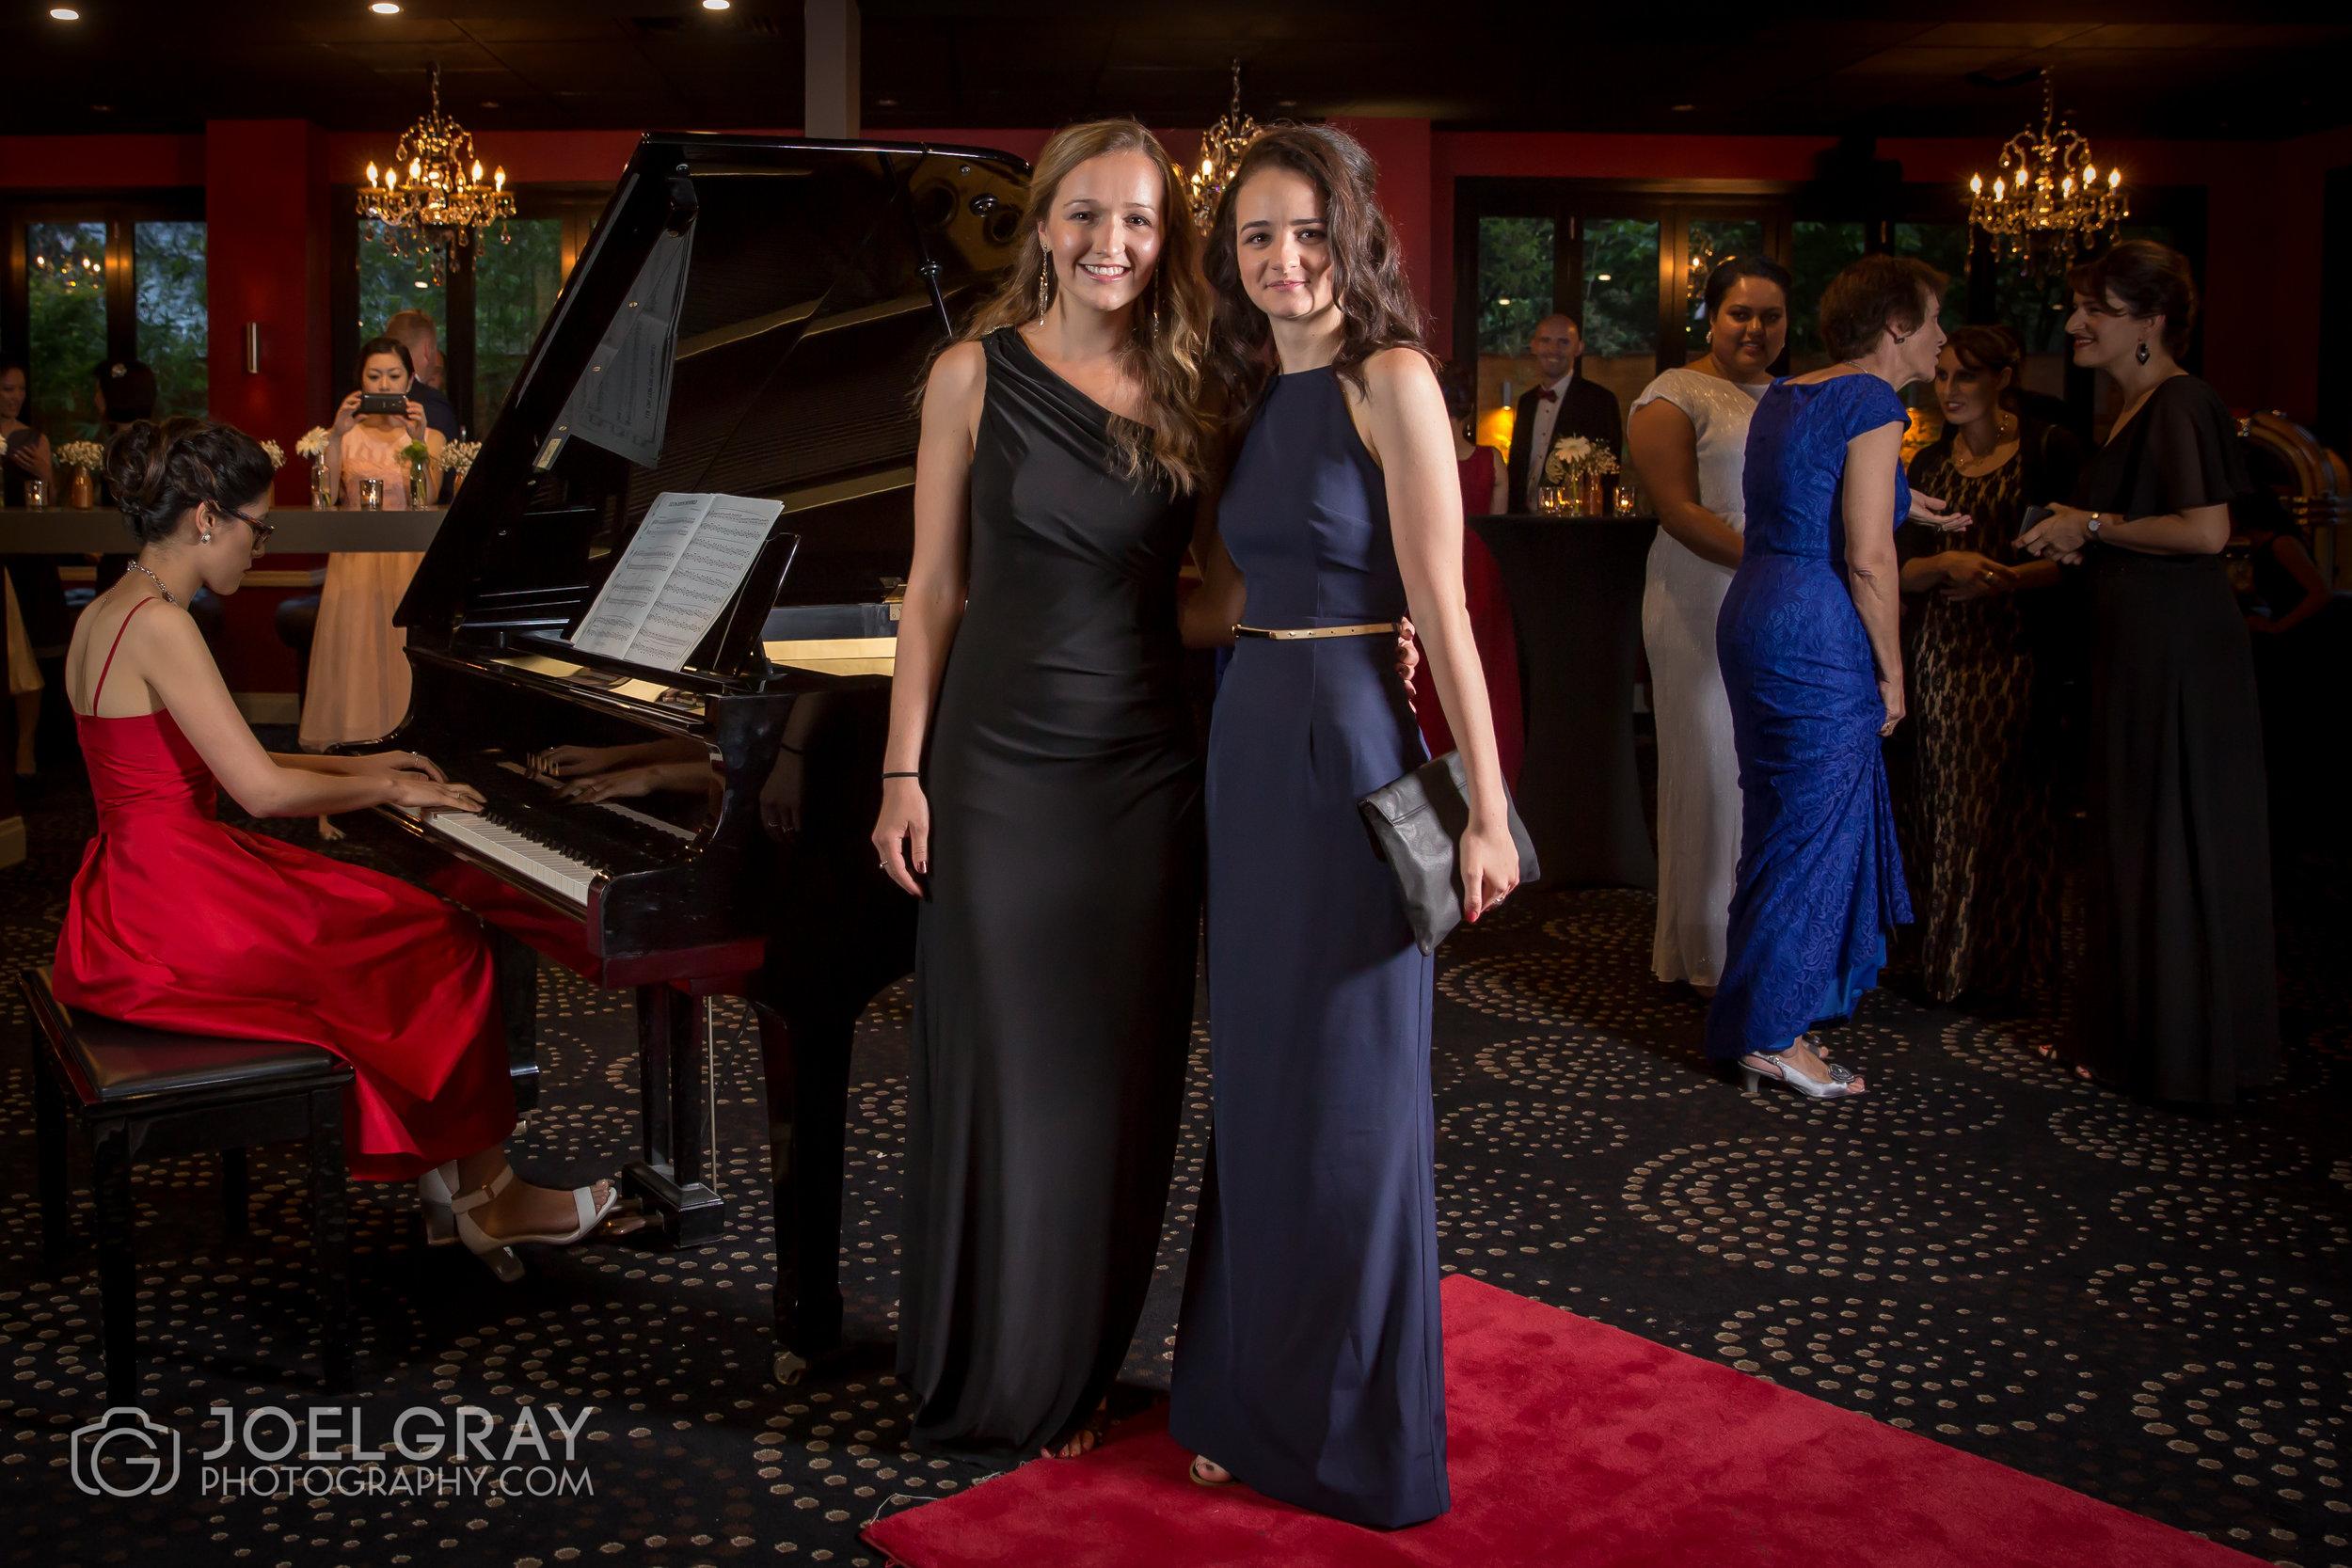 event-photographer-sydney-events-1800829994